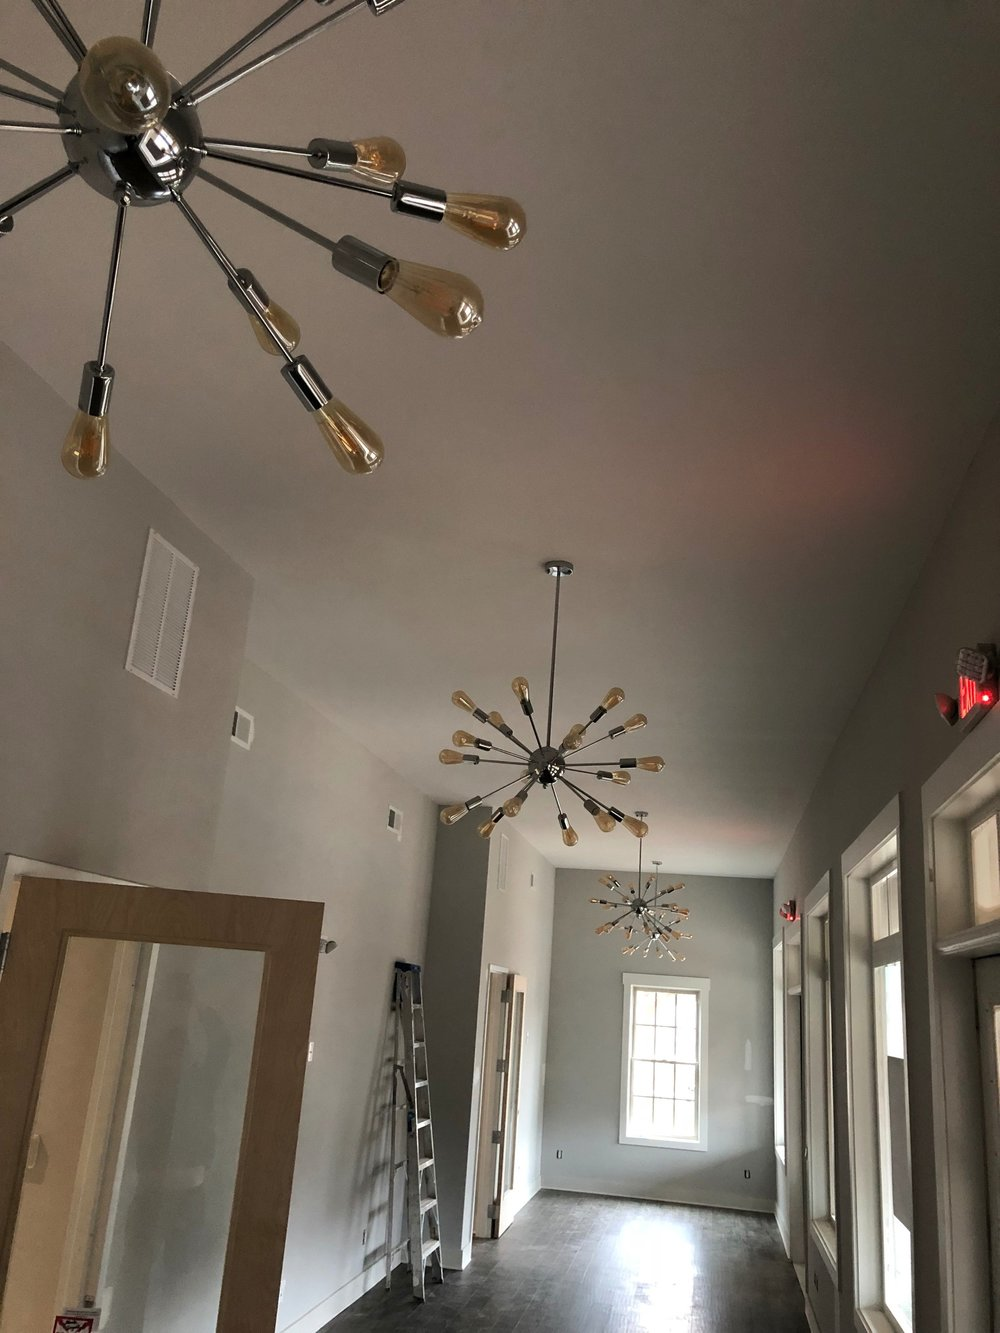 Lighting installed